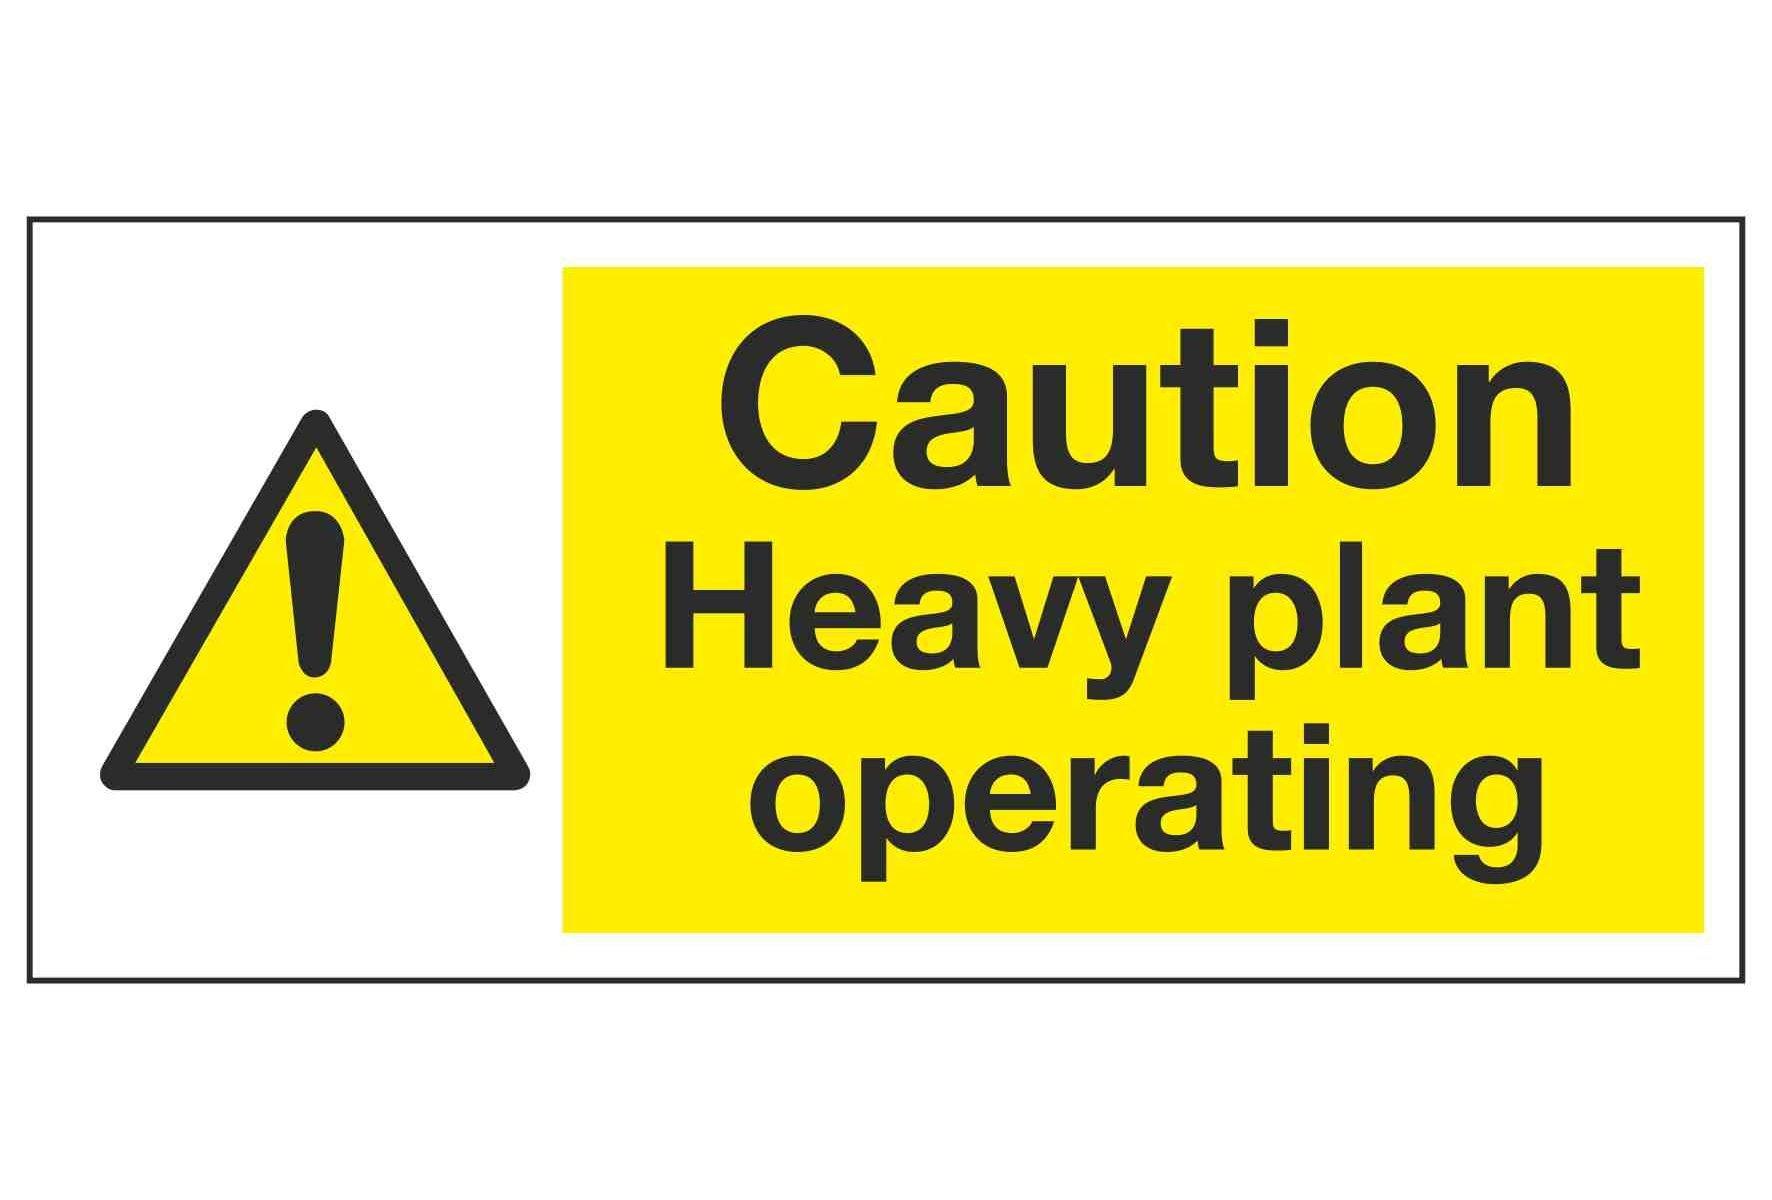 Caution Heavy plant operating